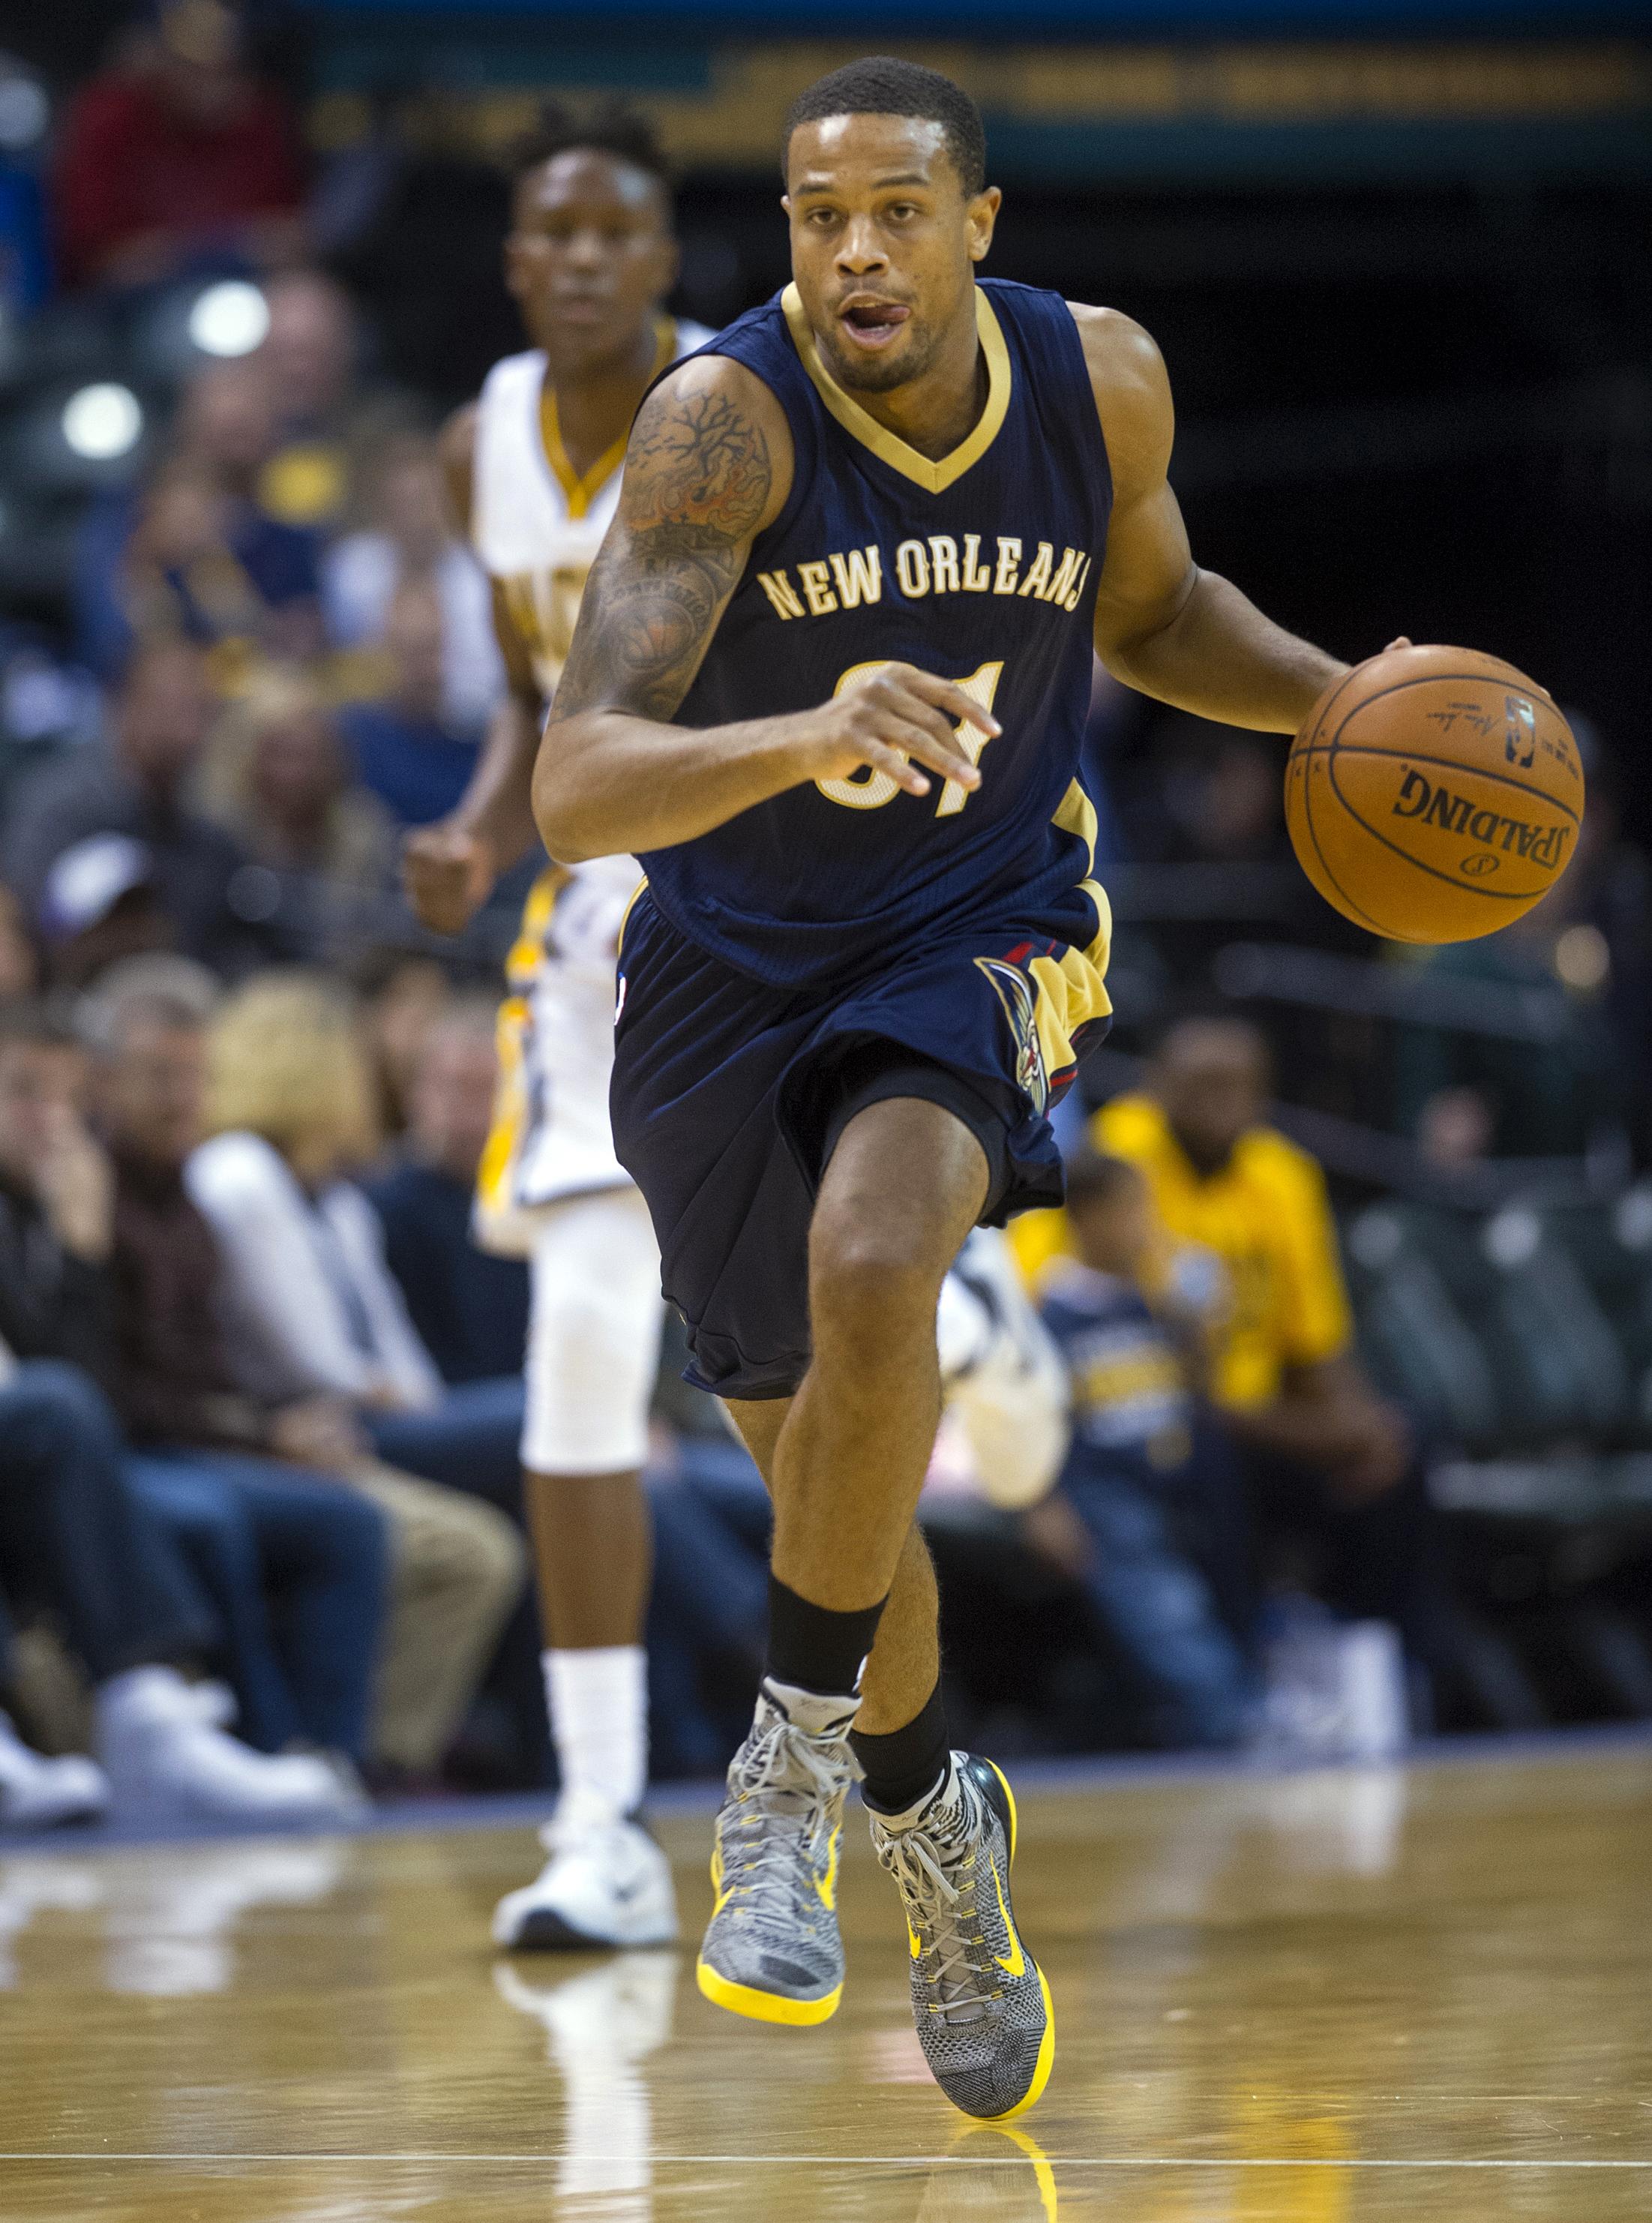 f23c49acae1 ASSOCIATED PRESS Enlarge. DALLAS — New Orleans Pelicans guard Bryce Dejean- Jones was fatally shot ...